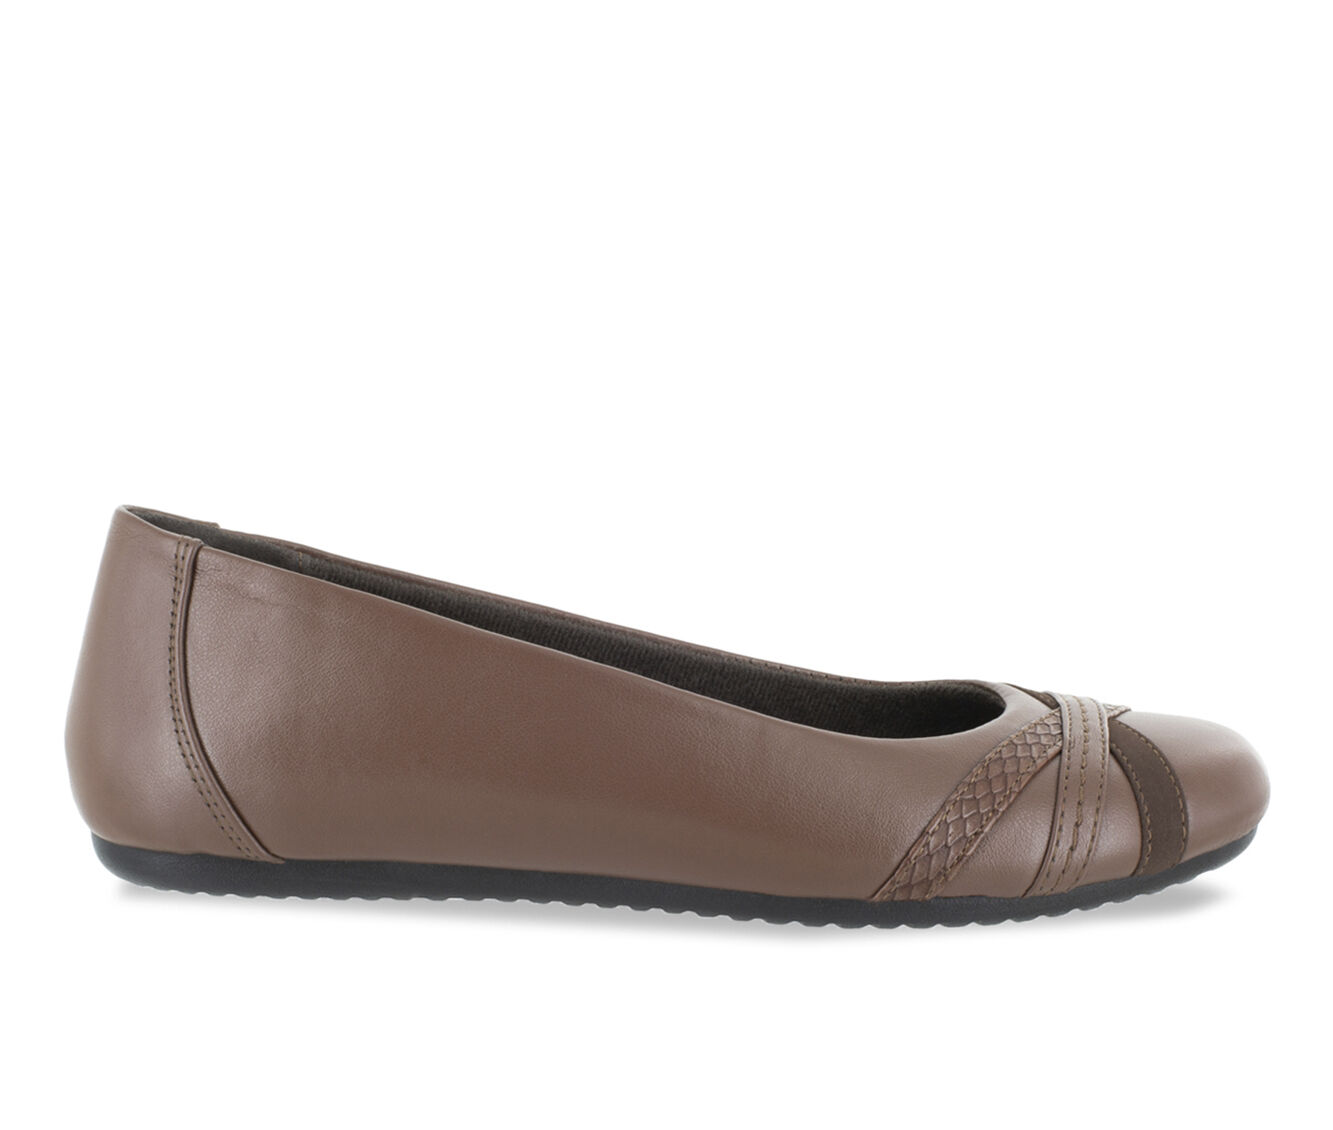 Women's Easy Street Derry Shoes Tan